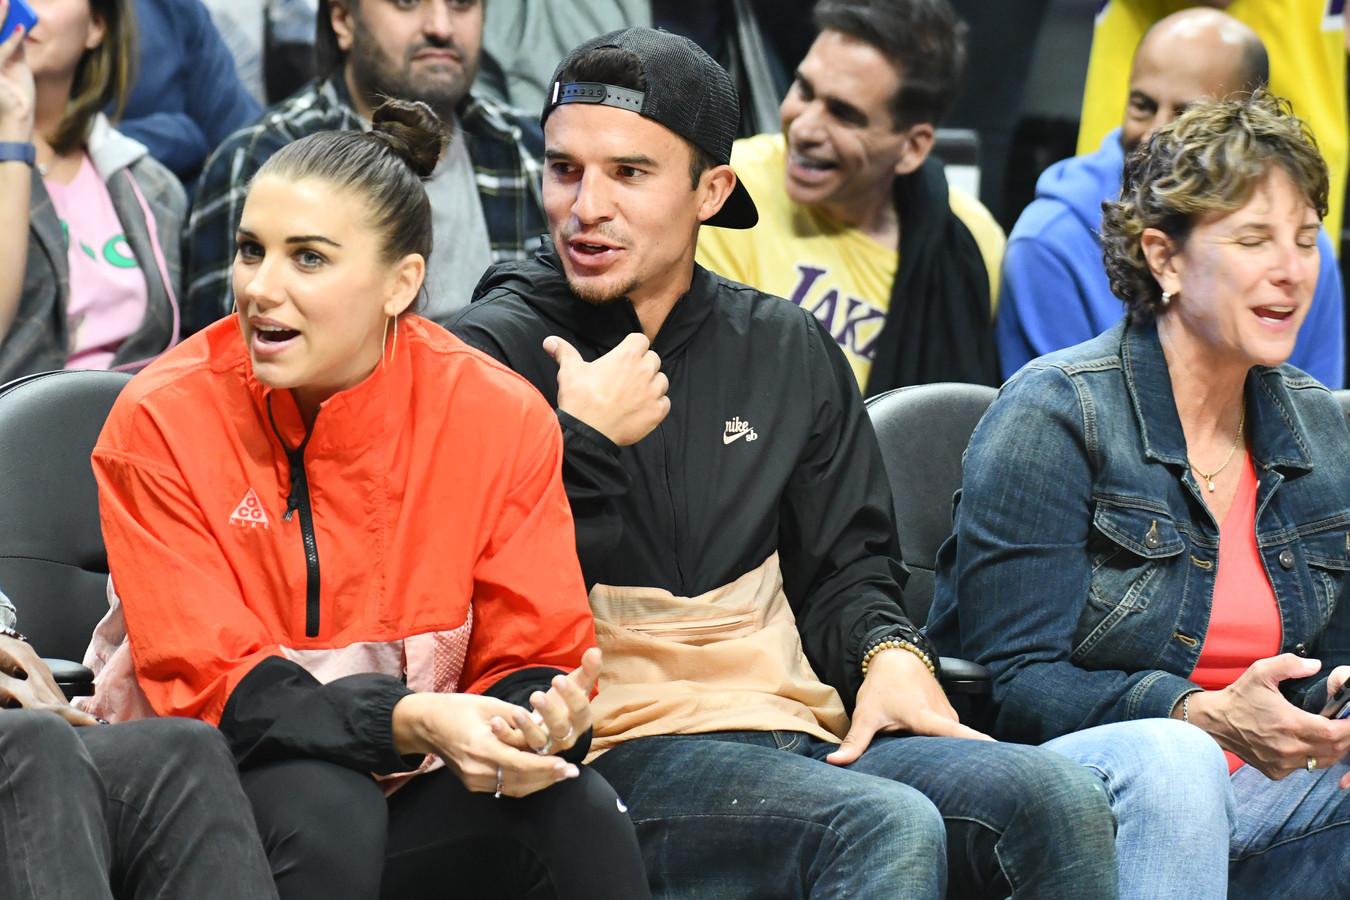 Alex Morgan en haar man Servando Carrasco tijdens de basketbalwedstrijd tussen de Los Angeles Clippers en de Los Angeles Lakers.